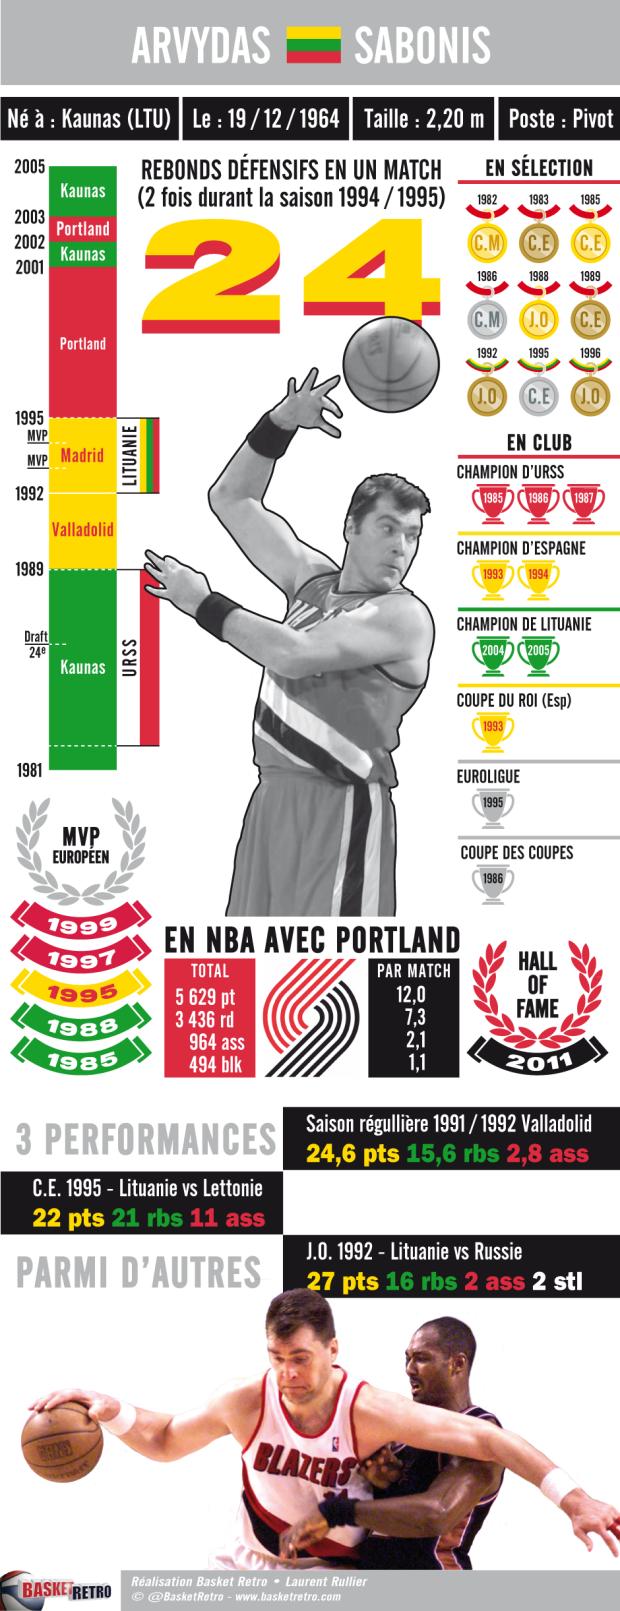 Infographie d'Arvydas Sabonis par Laurent Rullier